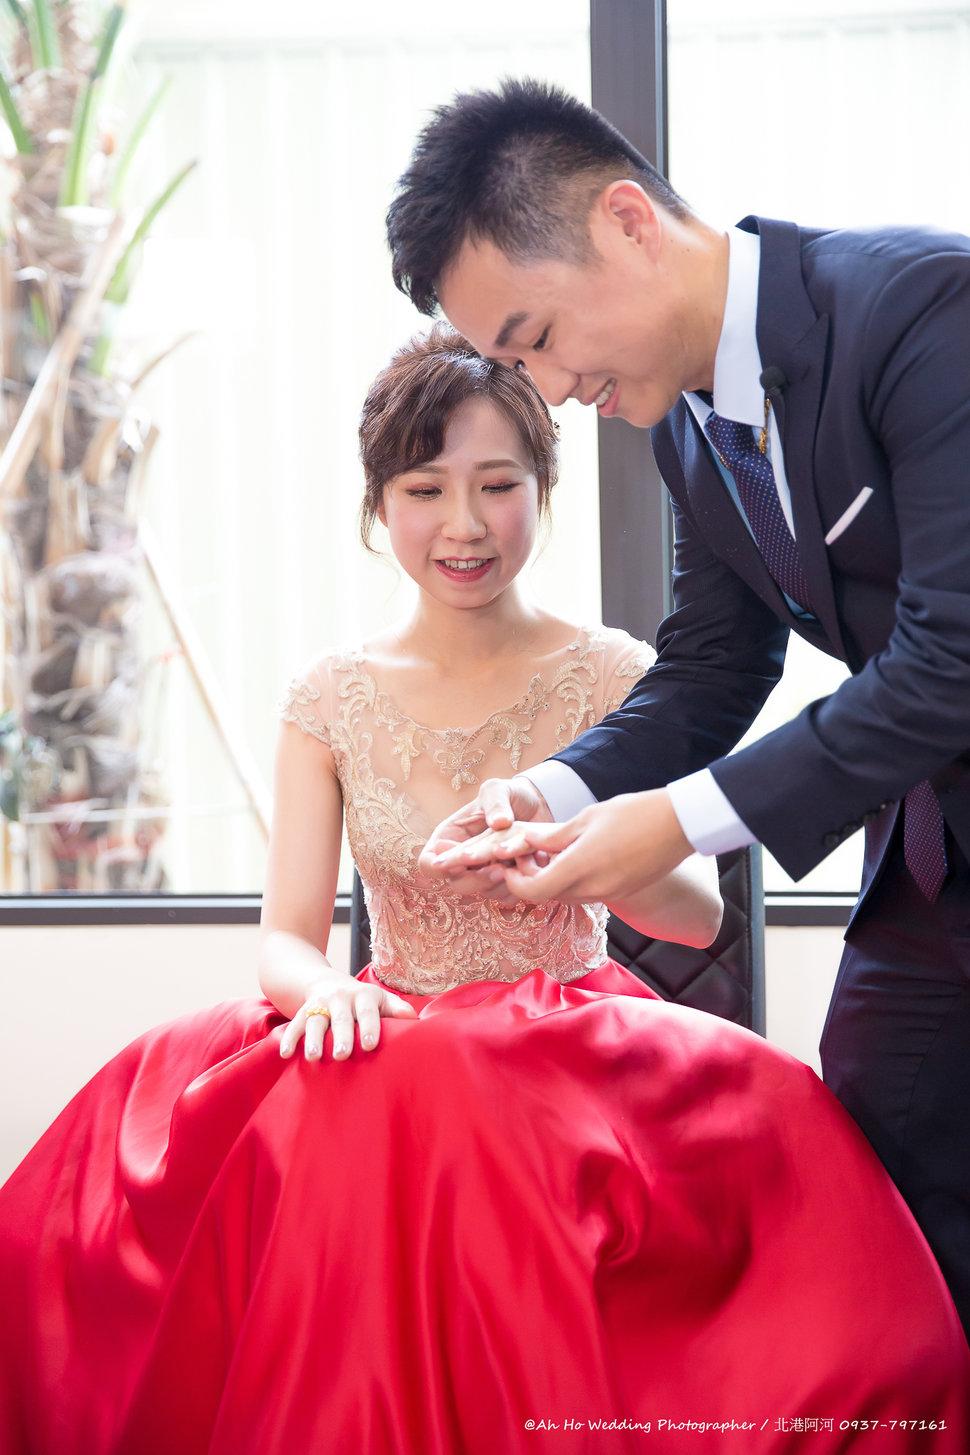 AhHo Wedding TEL-0937797161 lineID-chiupeiho-55 - 北港阿河婚攝 AhHoWedding - 結婚吧